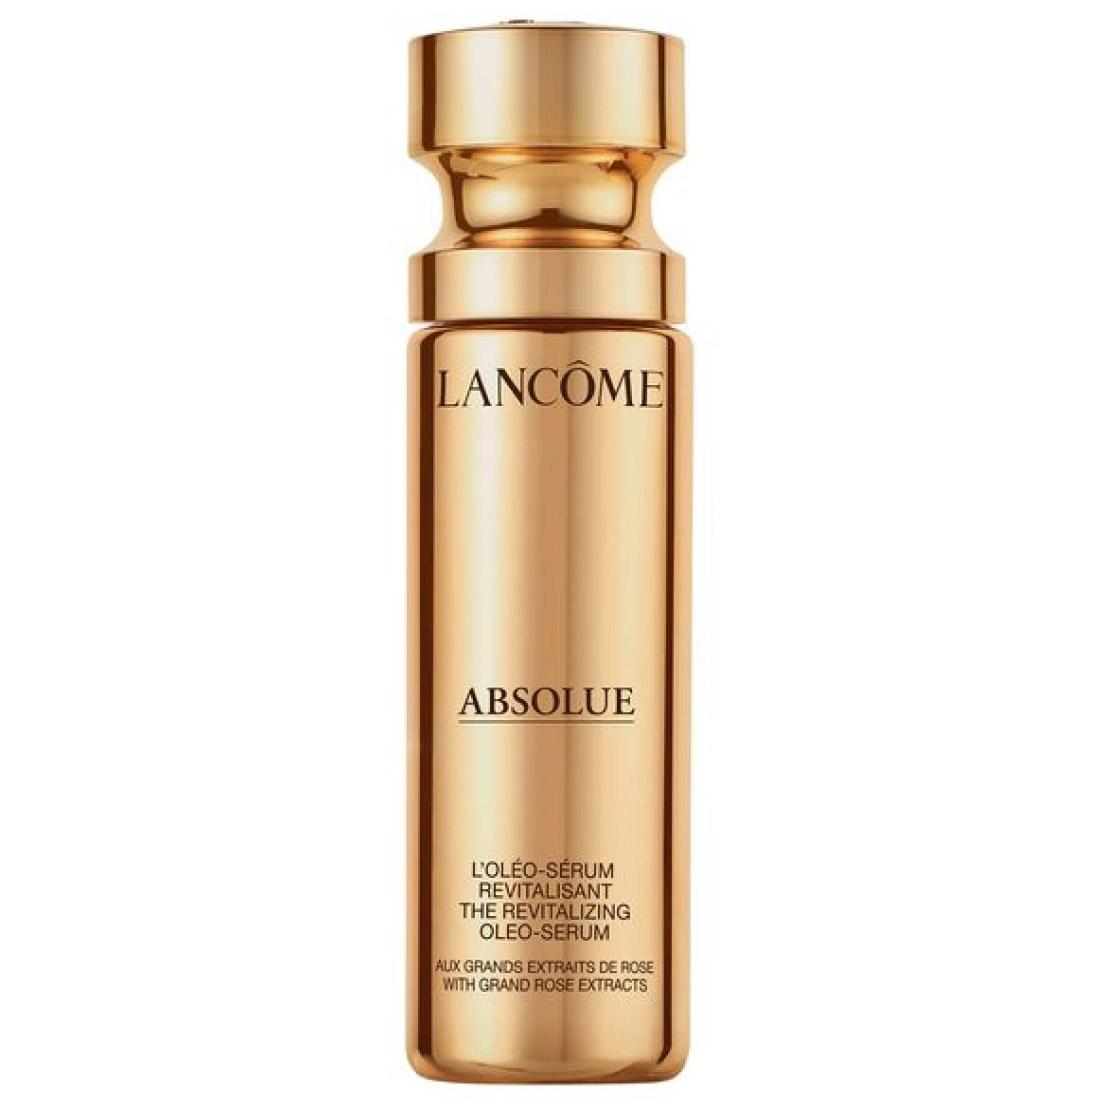 Lancôme - Absolue - L'Oléo-Sérum Revitalisant 30 ml